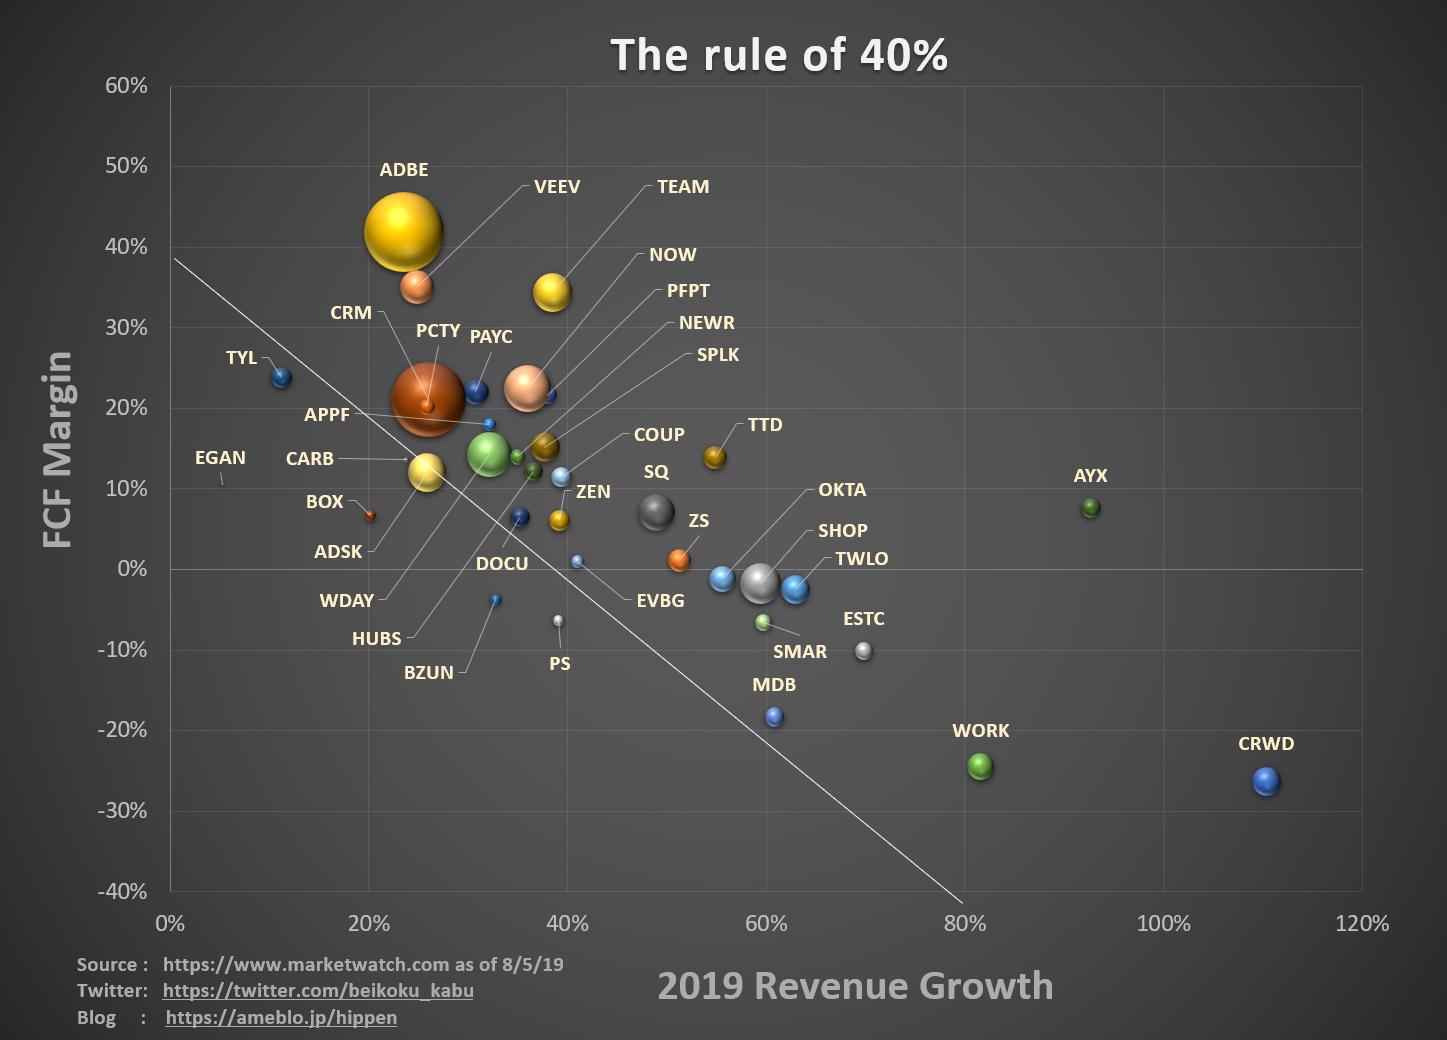 SaaS The rule of 40% 分布図を作ってみた。   米国株ぶろぐ